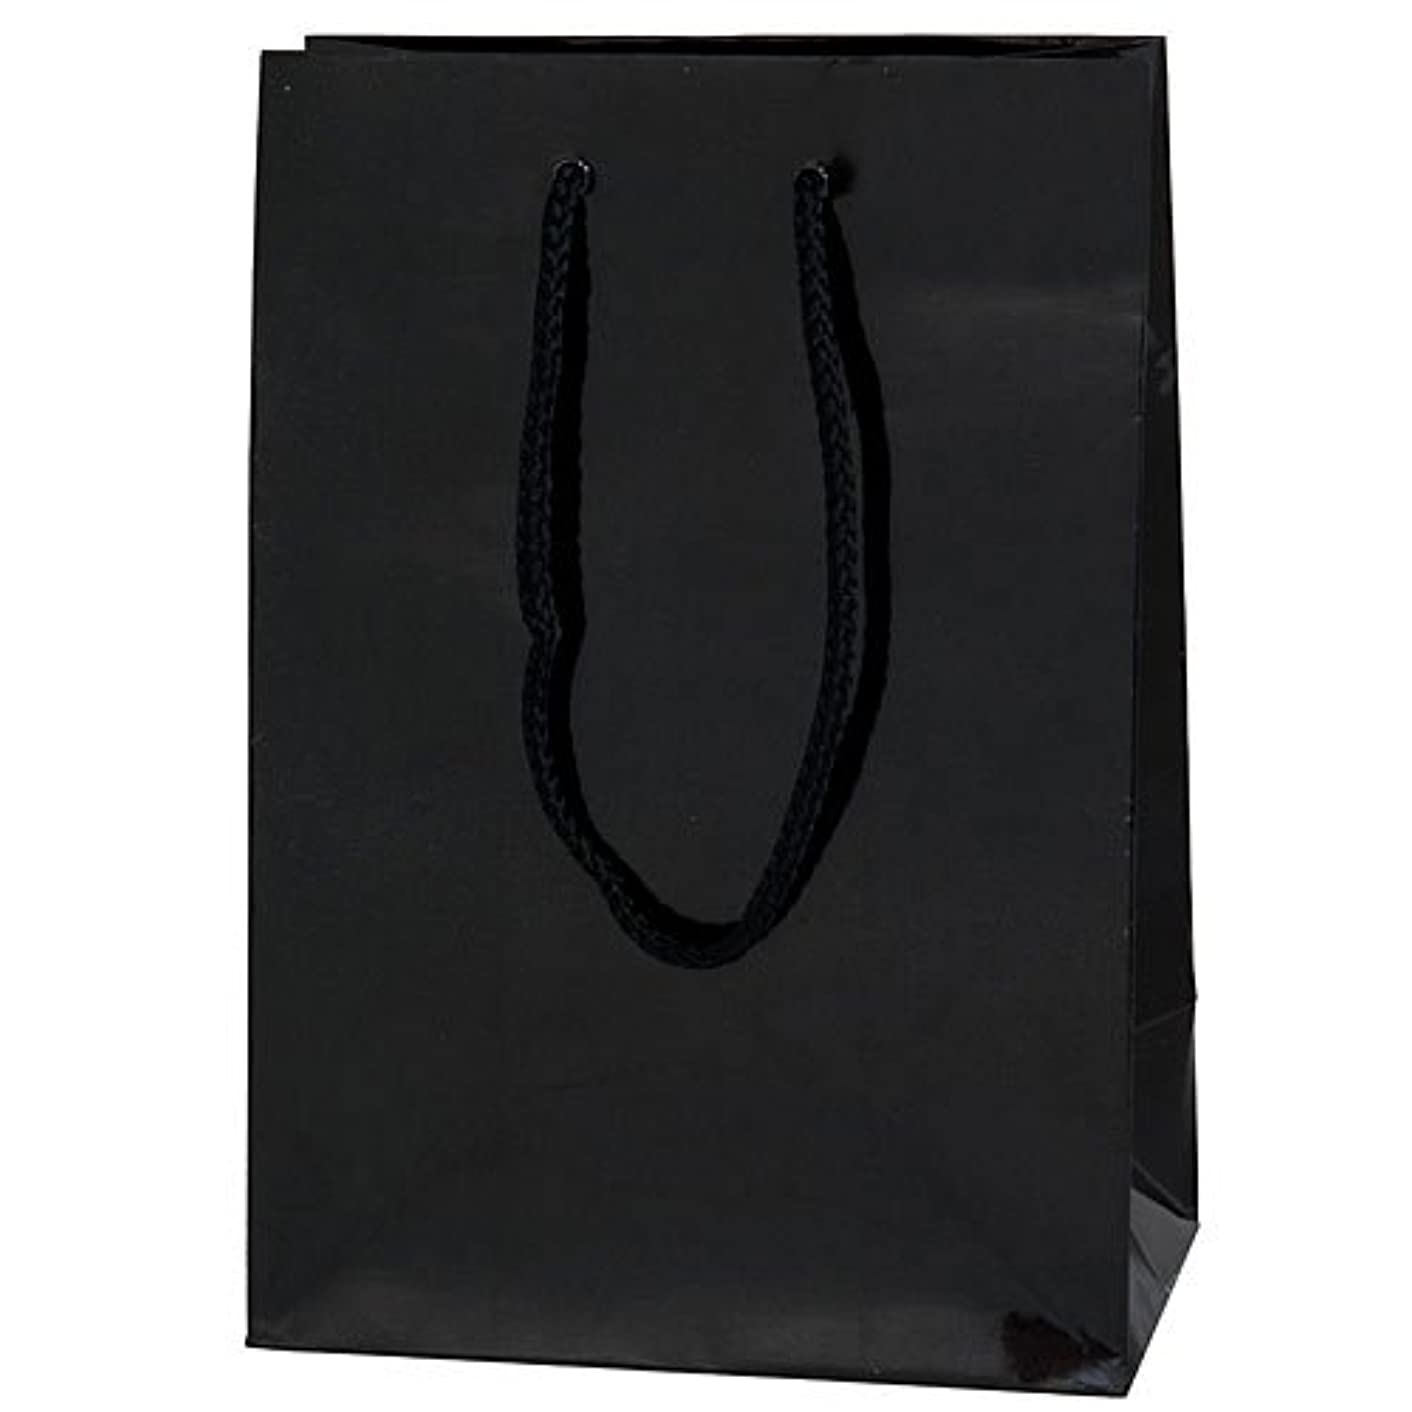 amscan Party Friendly Mini Glossy Gift Bag, Black, 7 3/4